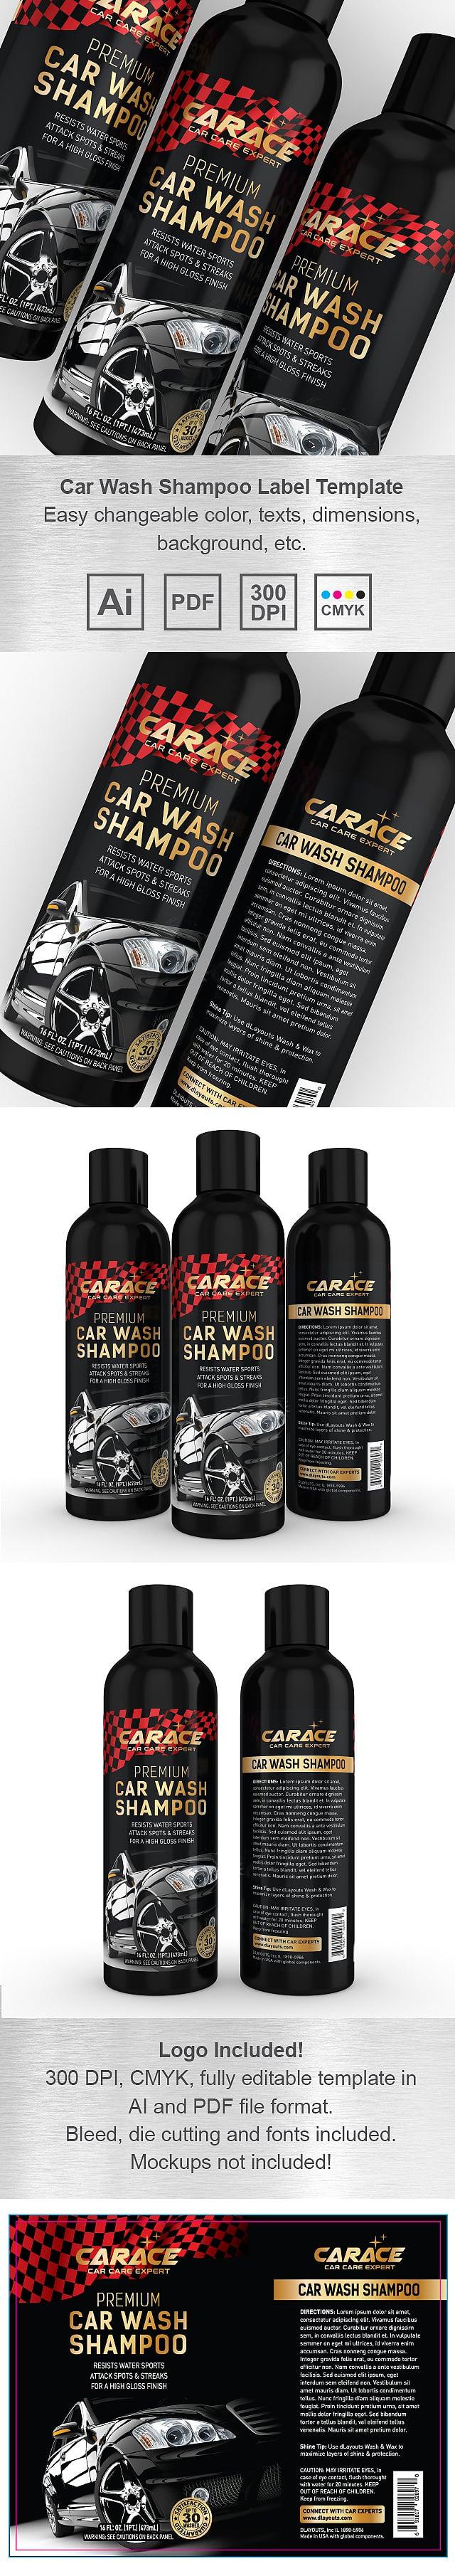 Car Wash Shampoo Label Template